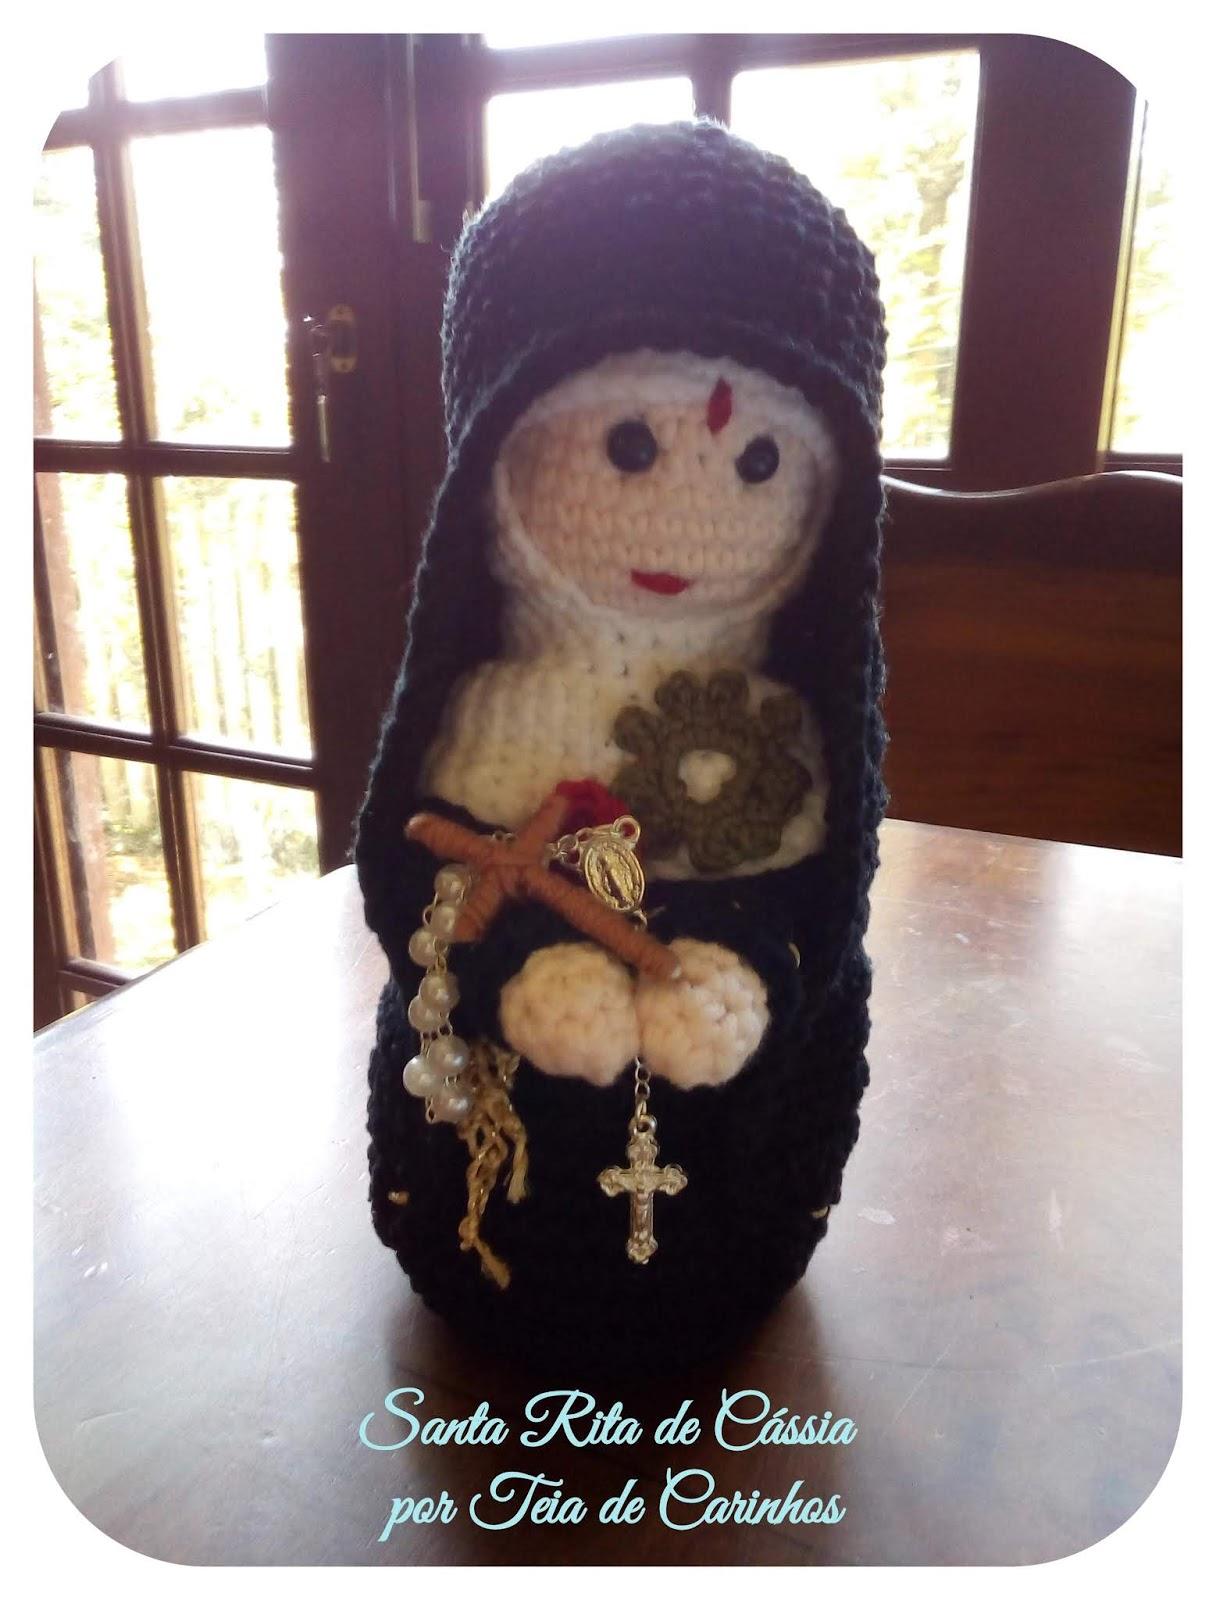 santa rita, santinha de crochê | Anjos de crochê, Bonecas de ... | 1600x1216